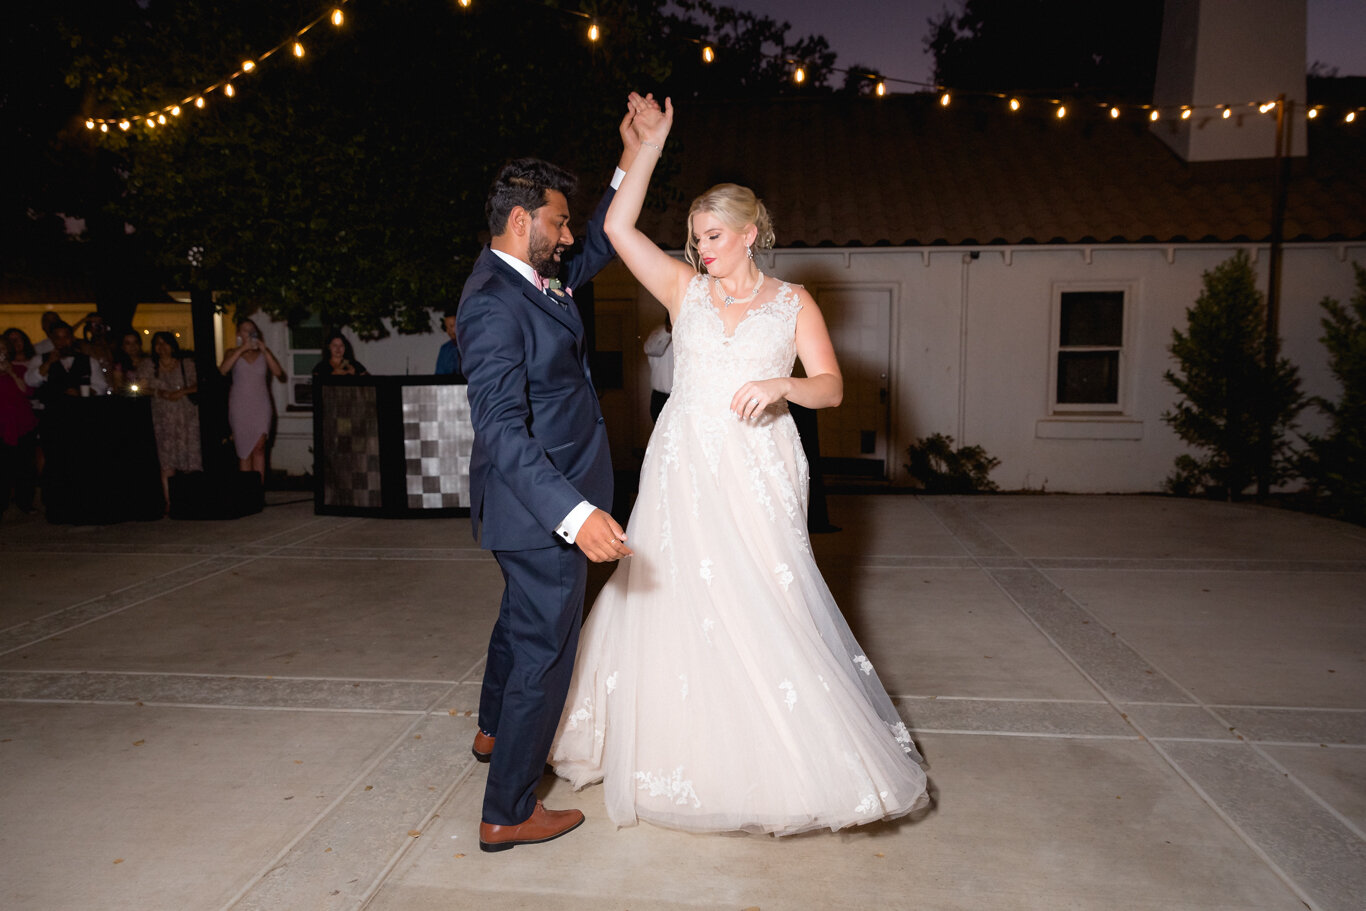 2019.08.24_Emily-Ashir-Wedding-at-the-Maples-6400.jpg